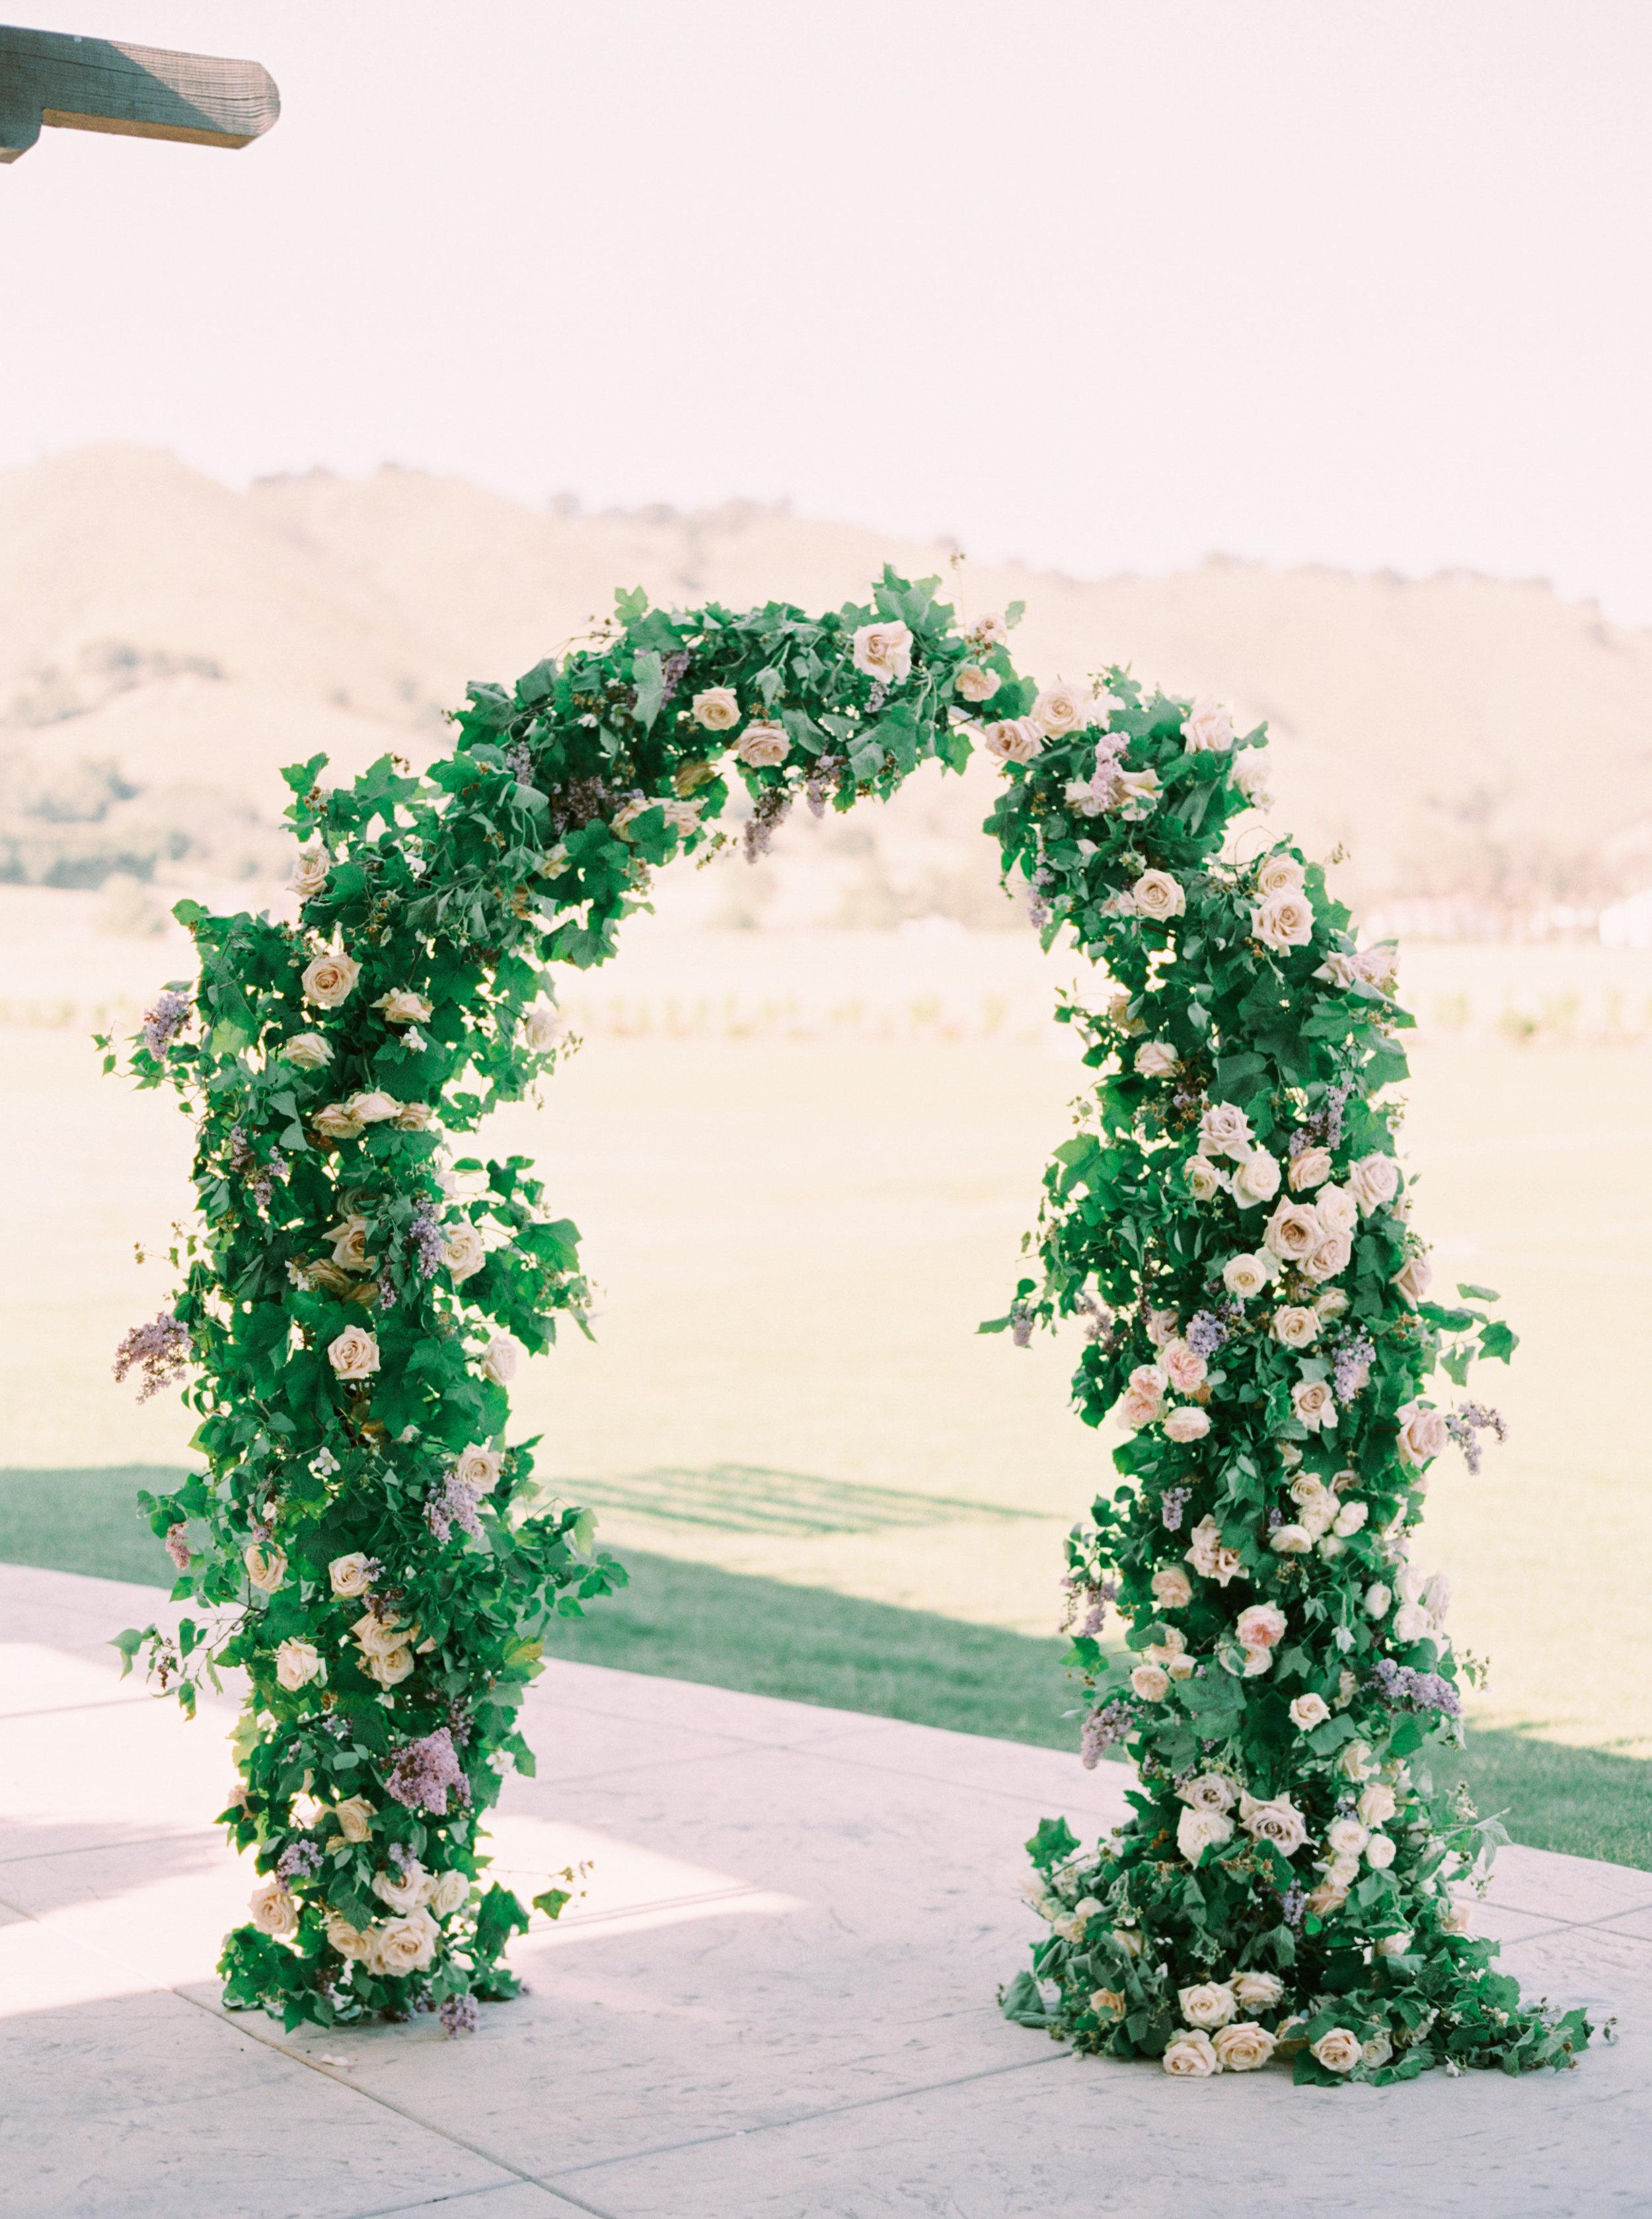 This-Love-of-Yours-Kirigin-Cellars-Flower-Arch-Styled-Shoot-101.jpg